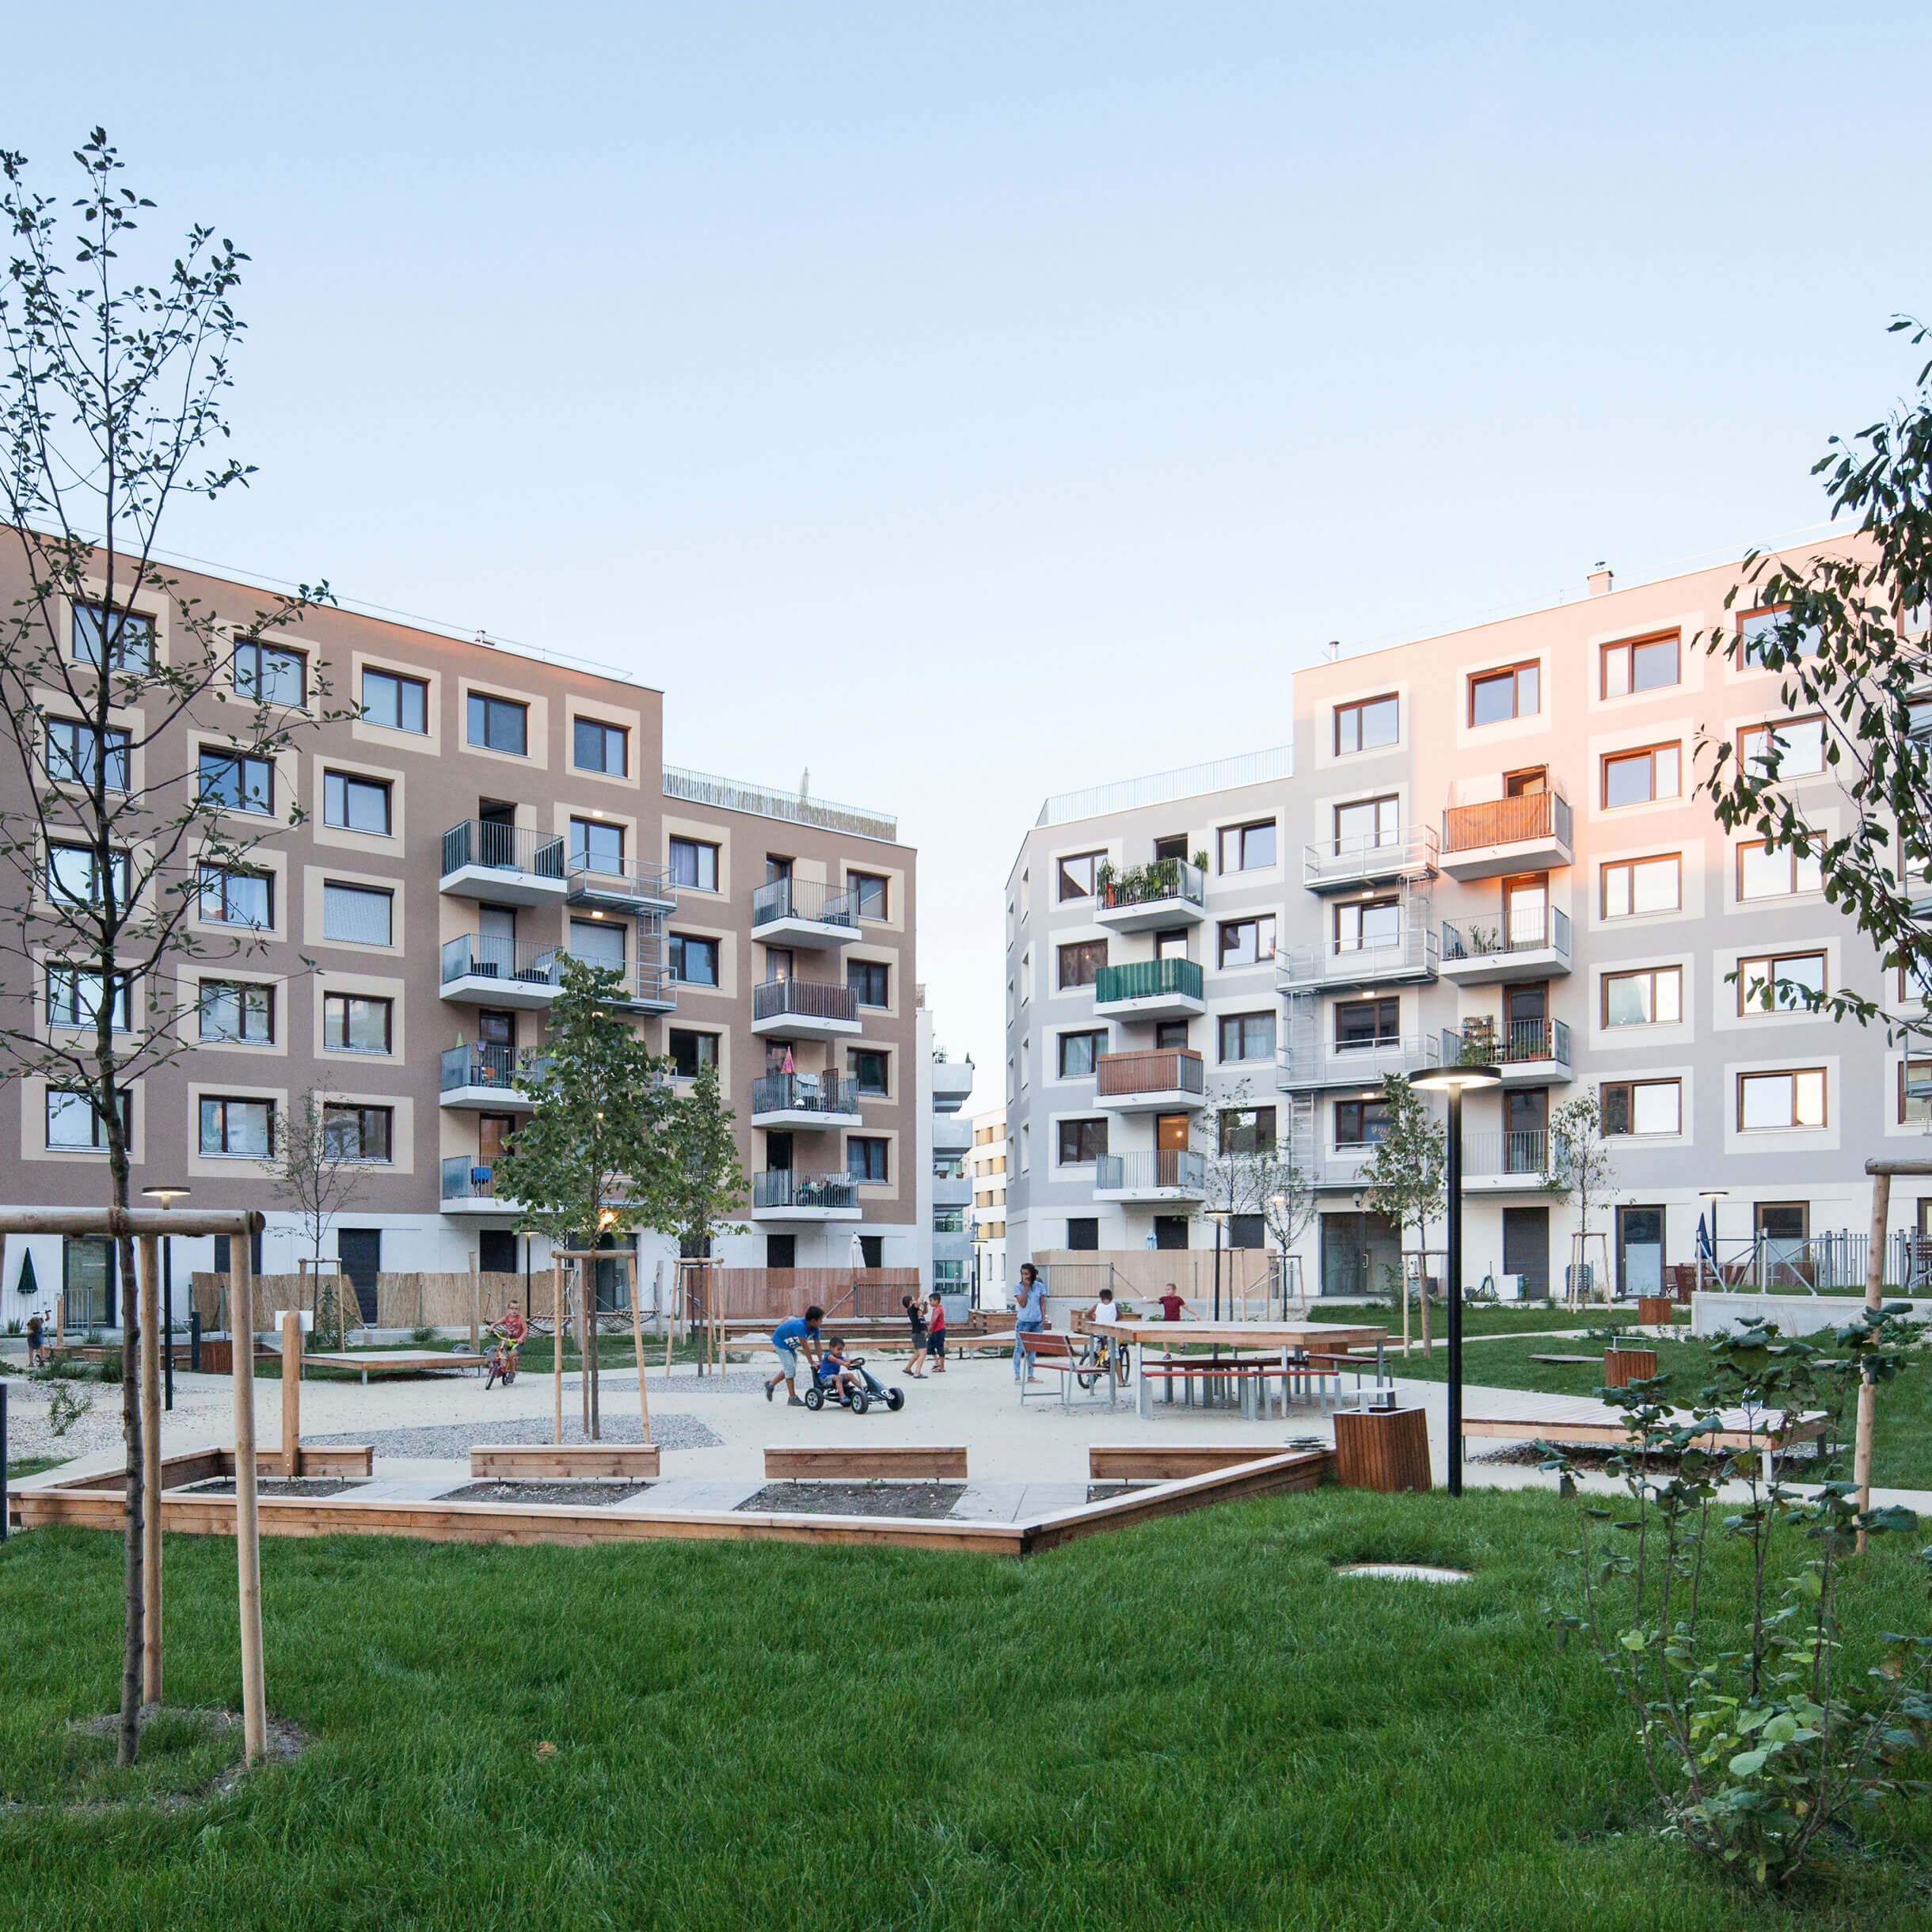 Architektura trvale udržitelných budov